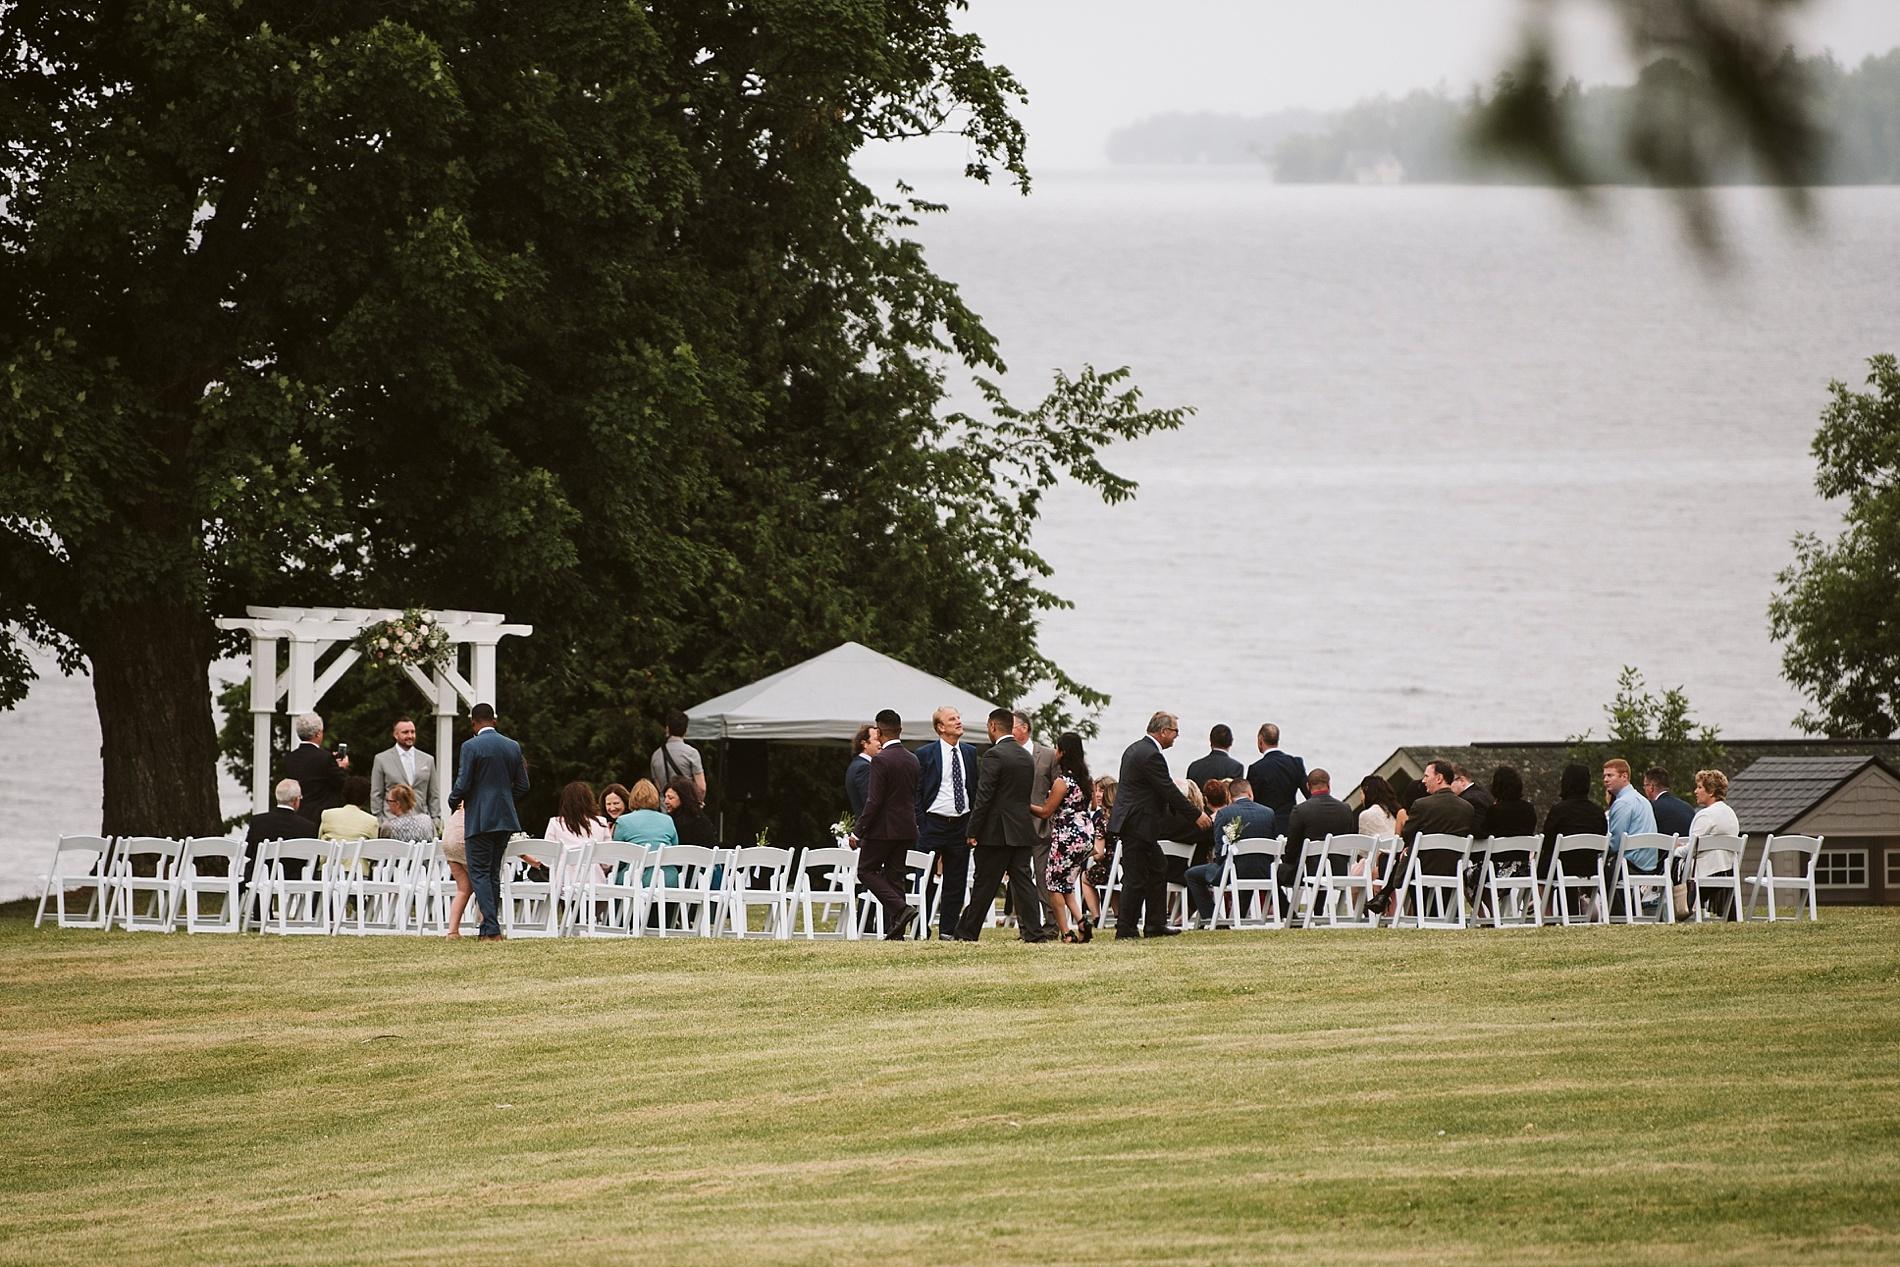 Kawartha_Lakes_Wedding_Bobcageon_Eganridge_Resort_Toronto_Photographer_0027.jpg